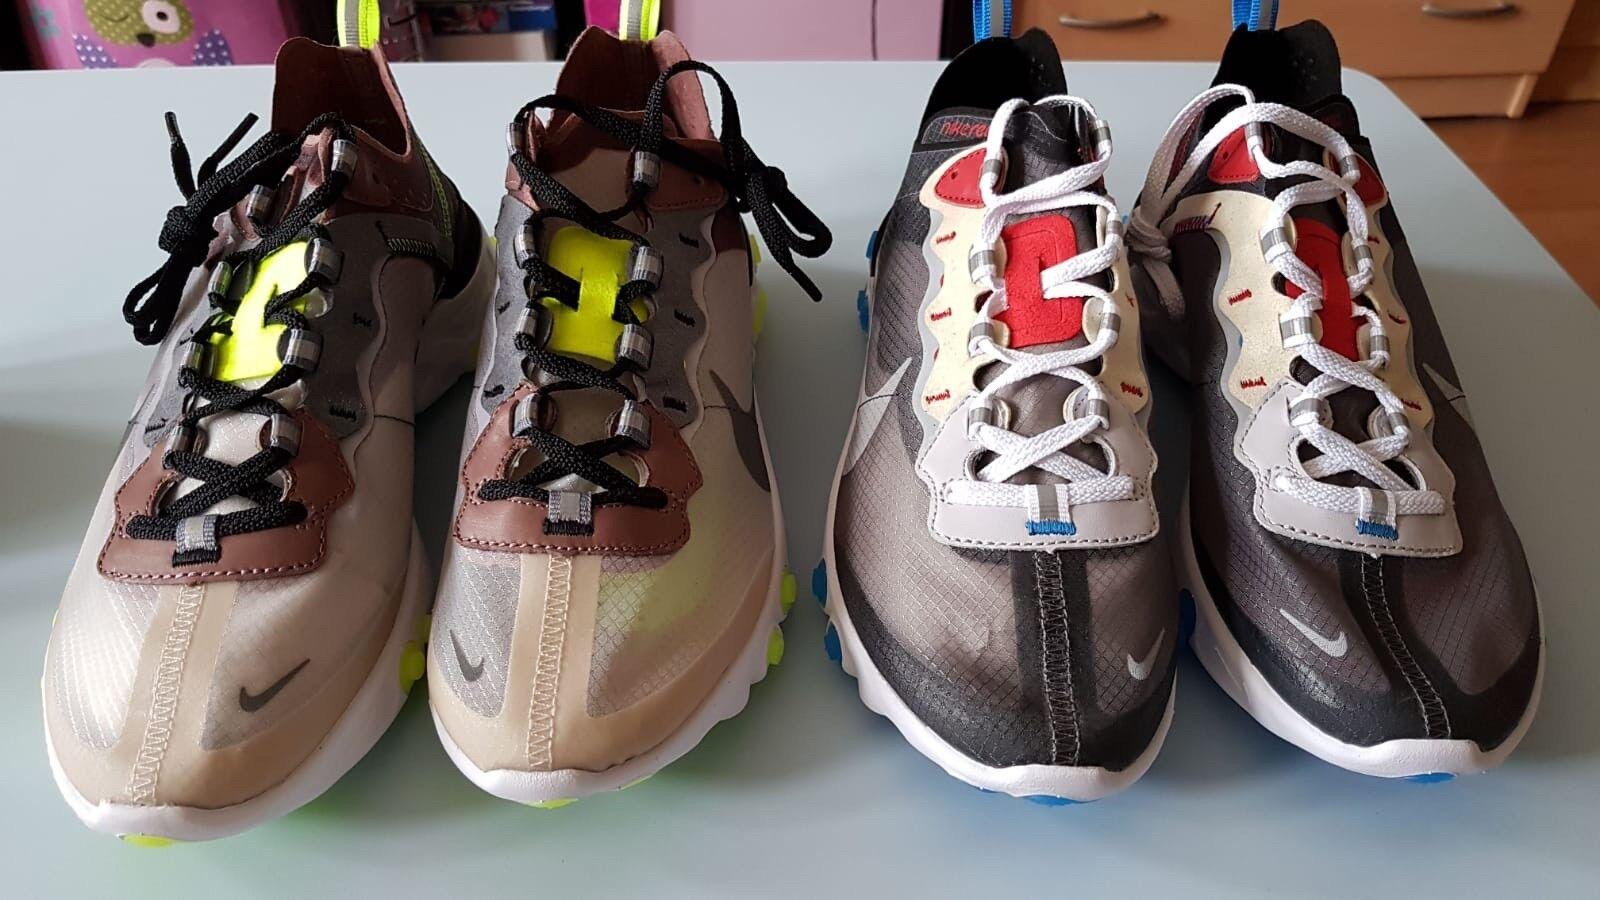 Nike React Element 87 Desert Sand Green6.5 Beige Green6.5 Sand cacca3